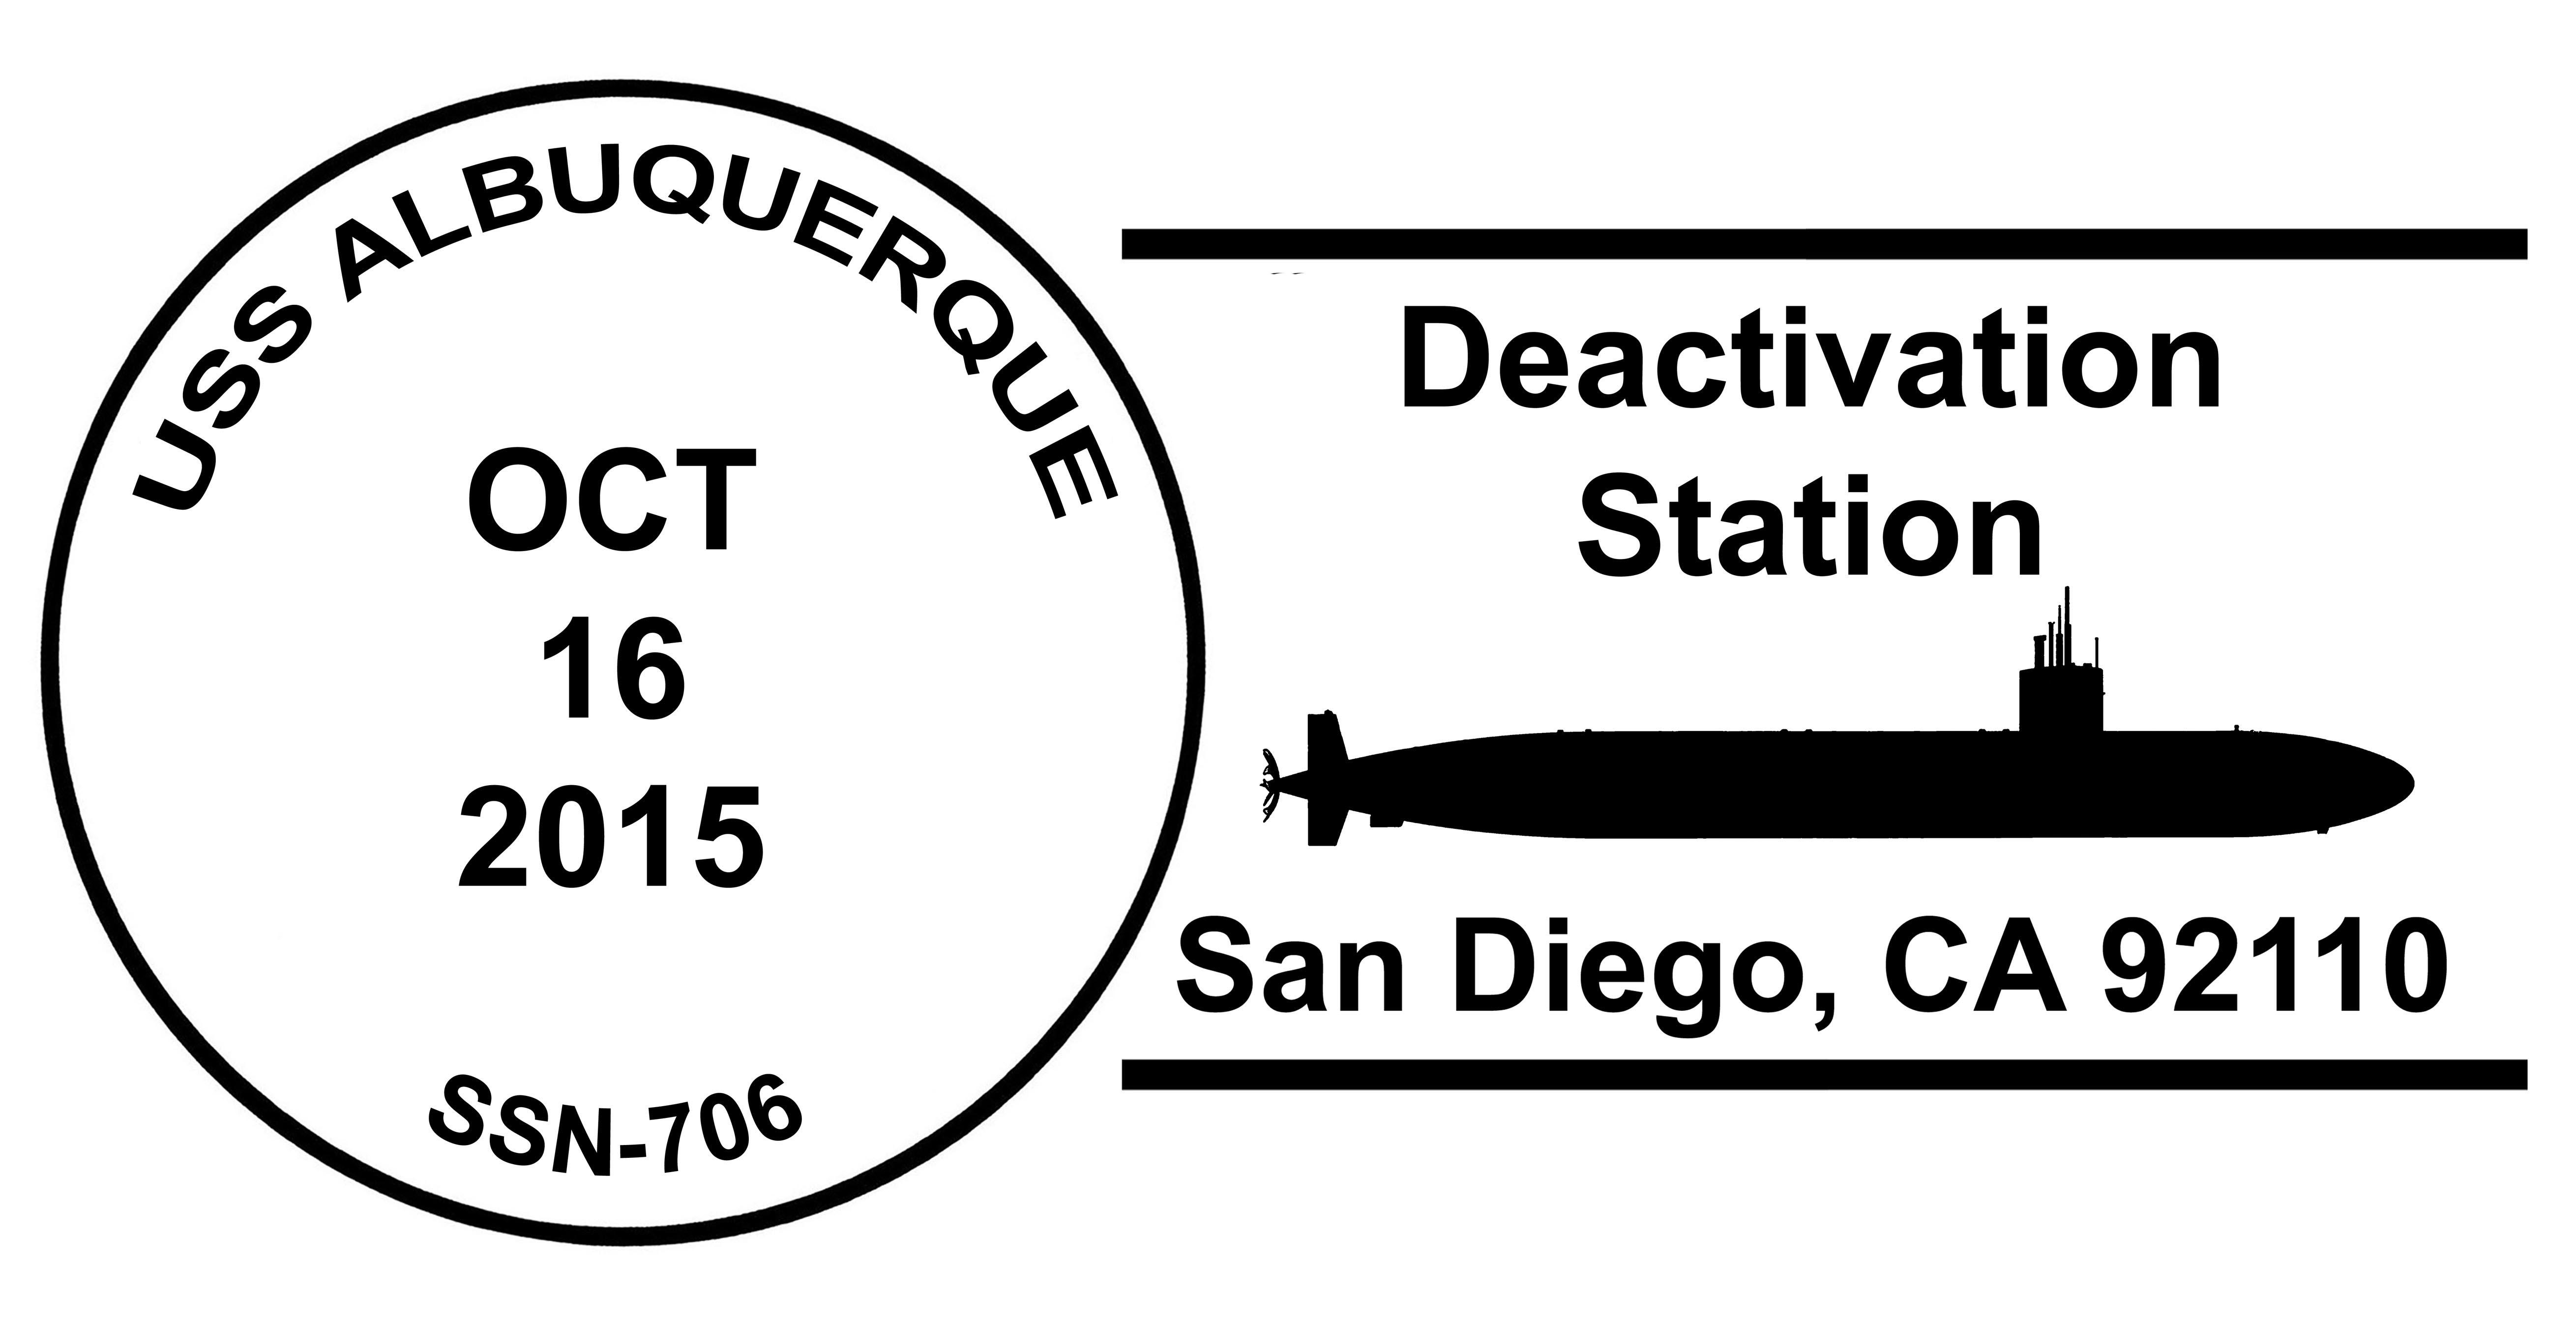 Sonderpoststempel USS ALBUQUERQUE SSN-706 Deactivation Design: Wolfgang Hechler